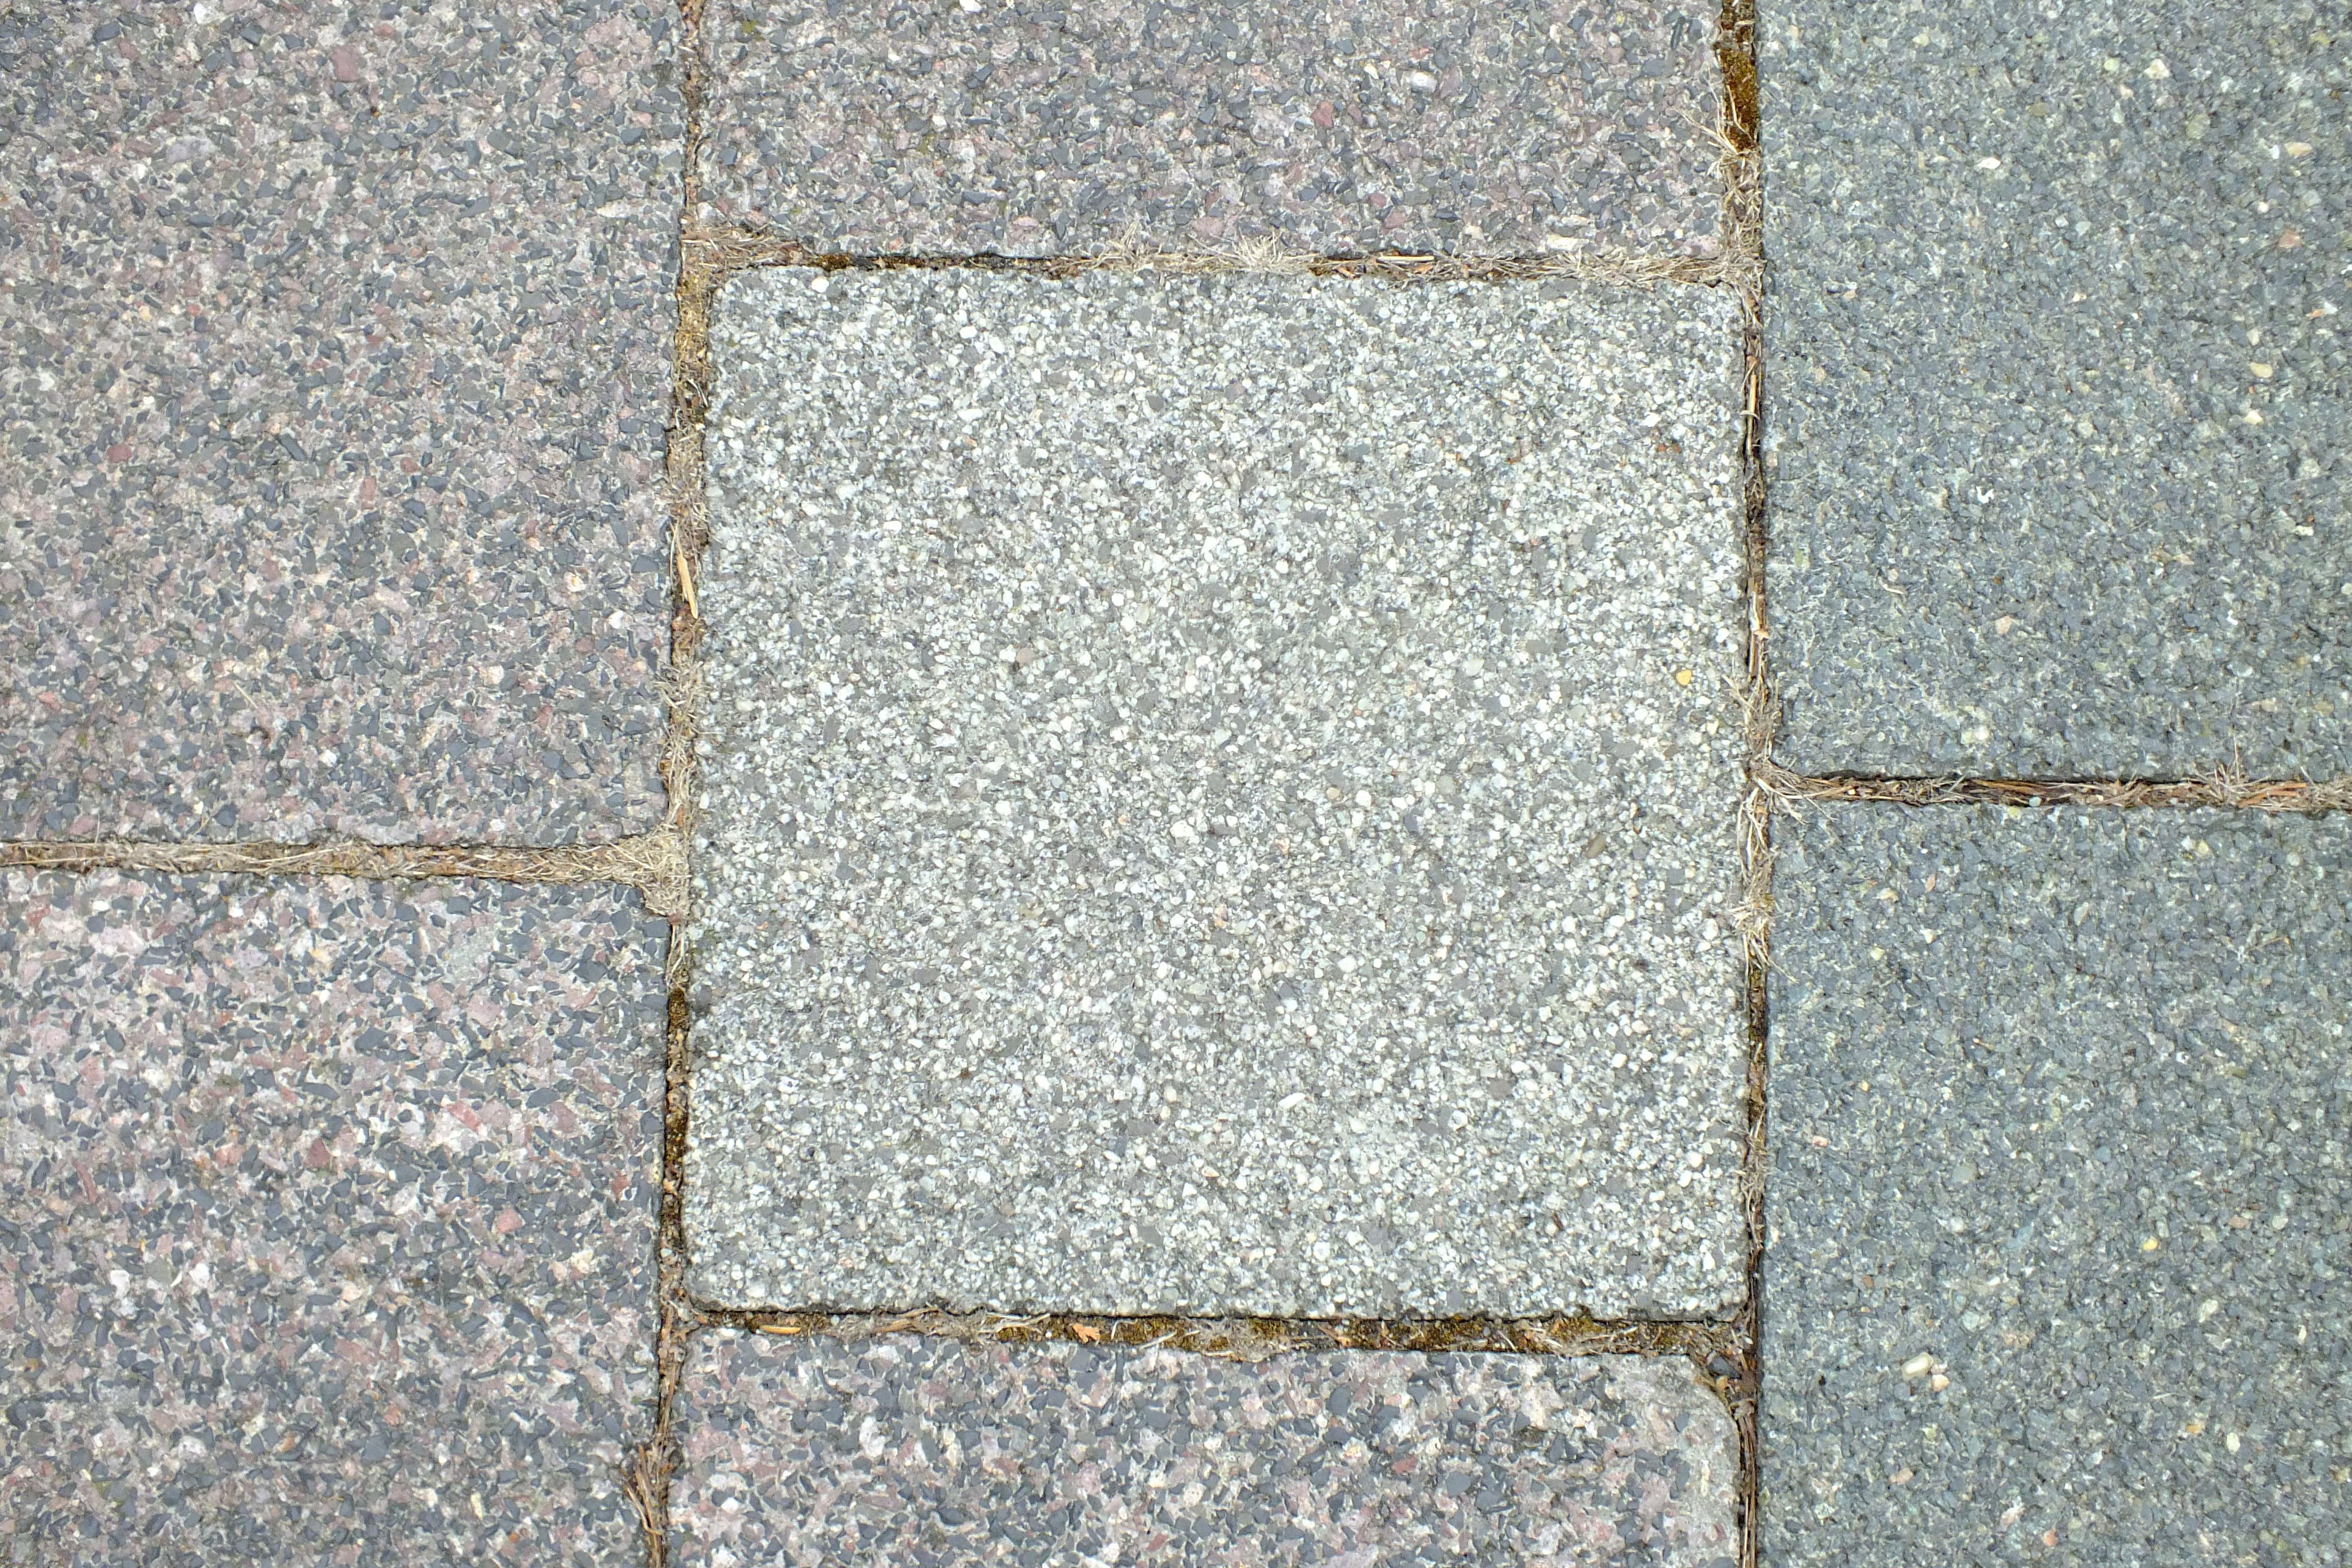 Pavement Texture, Gray, Grey, Pavement, Rock, HQ Photo